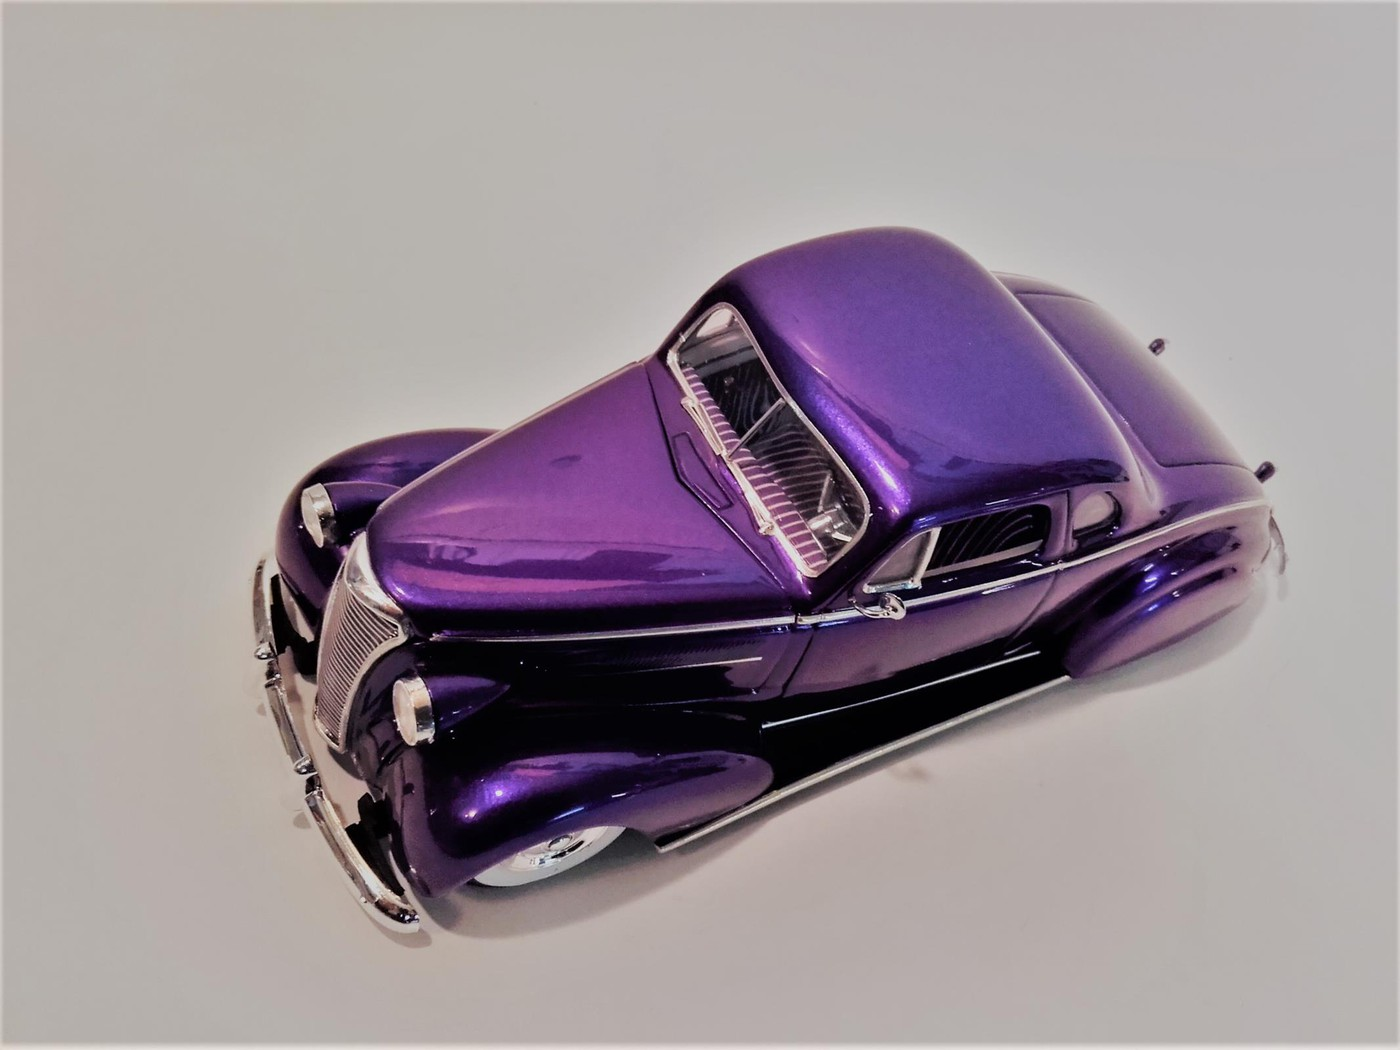 Projet Chevy 37 custom terminée  - Page 2 Photo71-vi